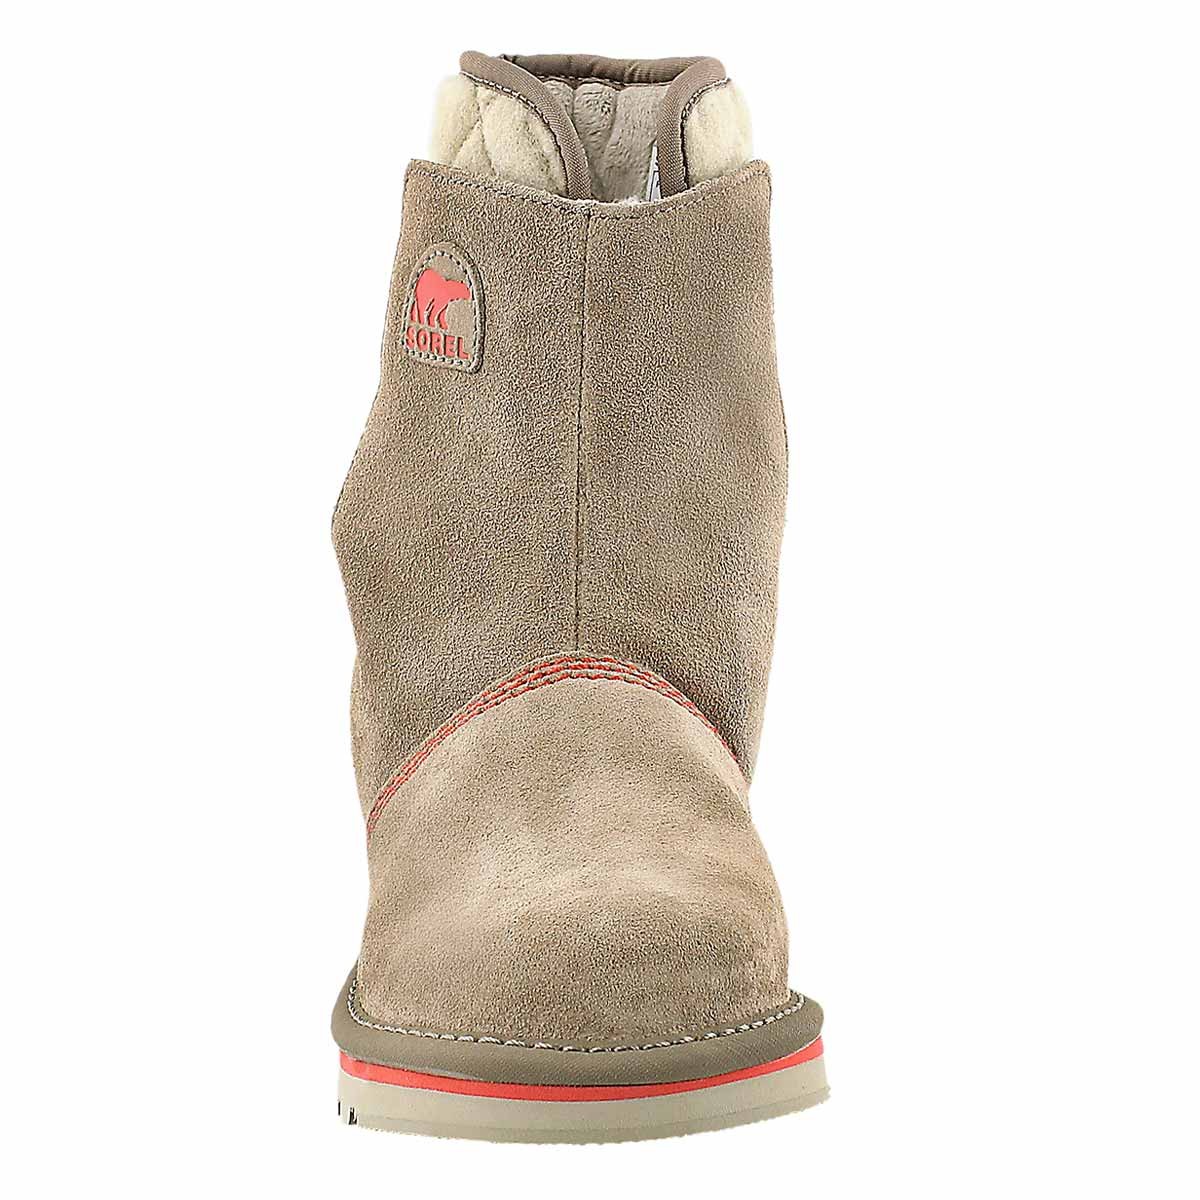 Grls Youth Newbie tan casual boot